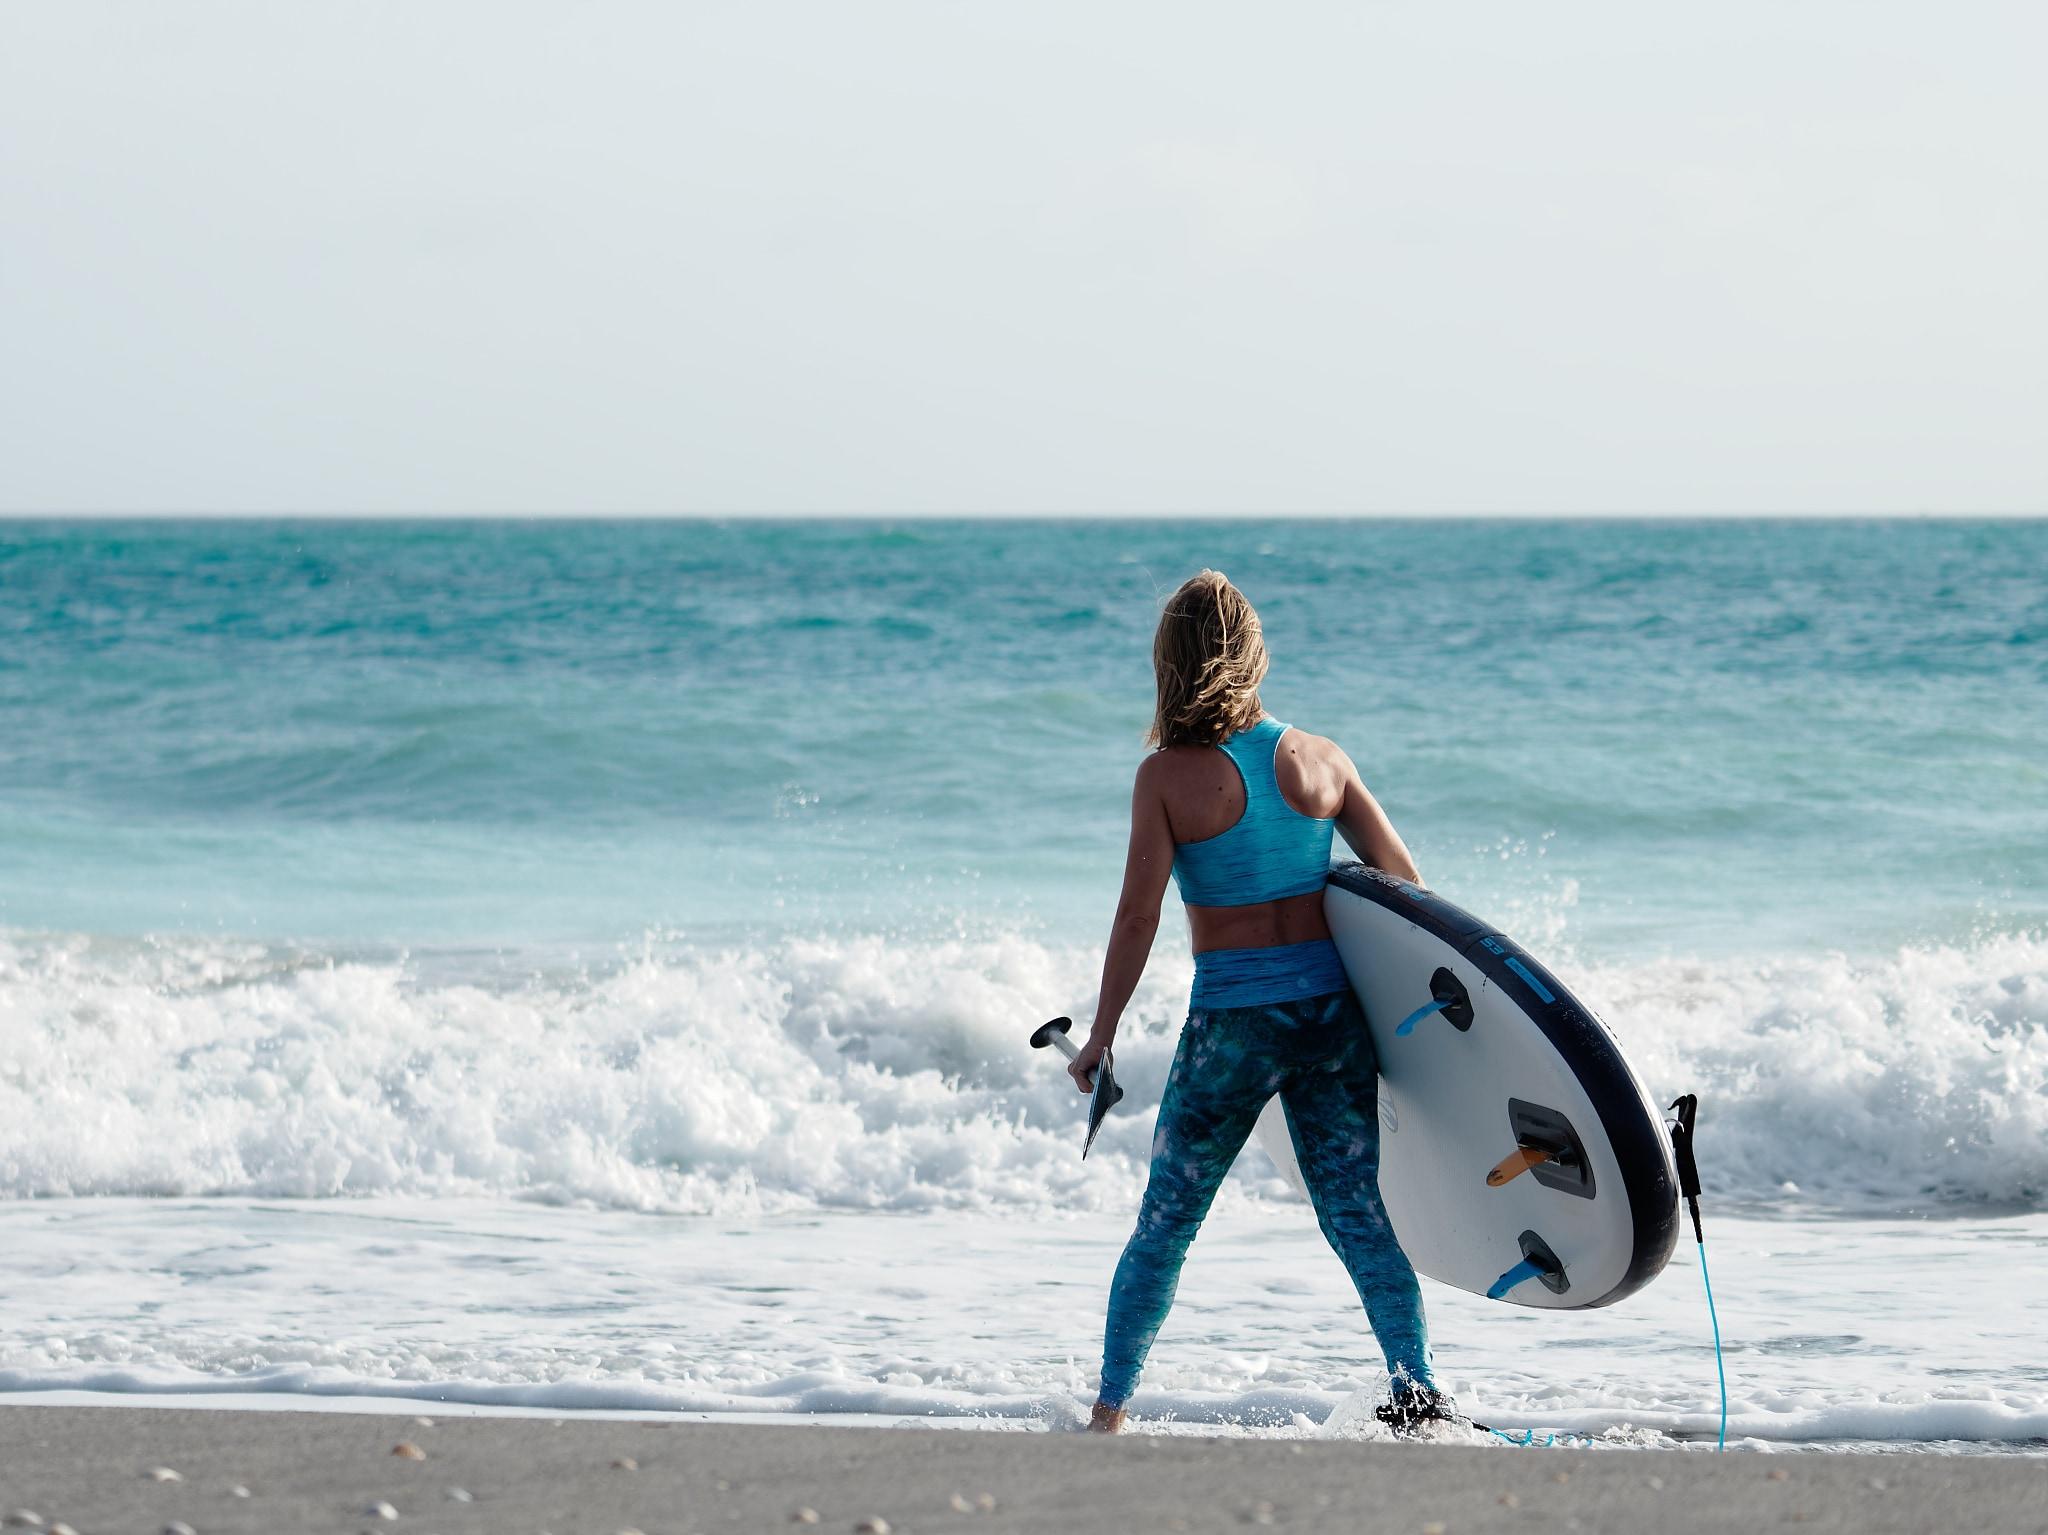 Paddle board rider near waves